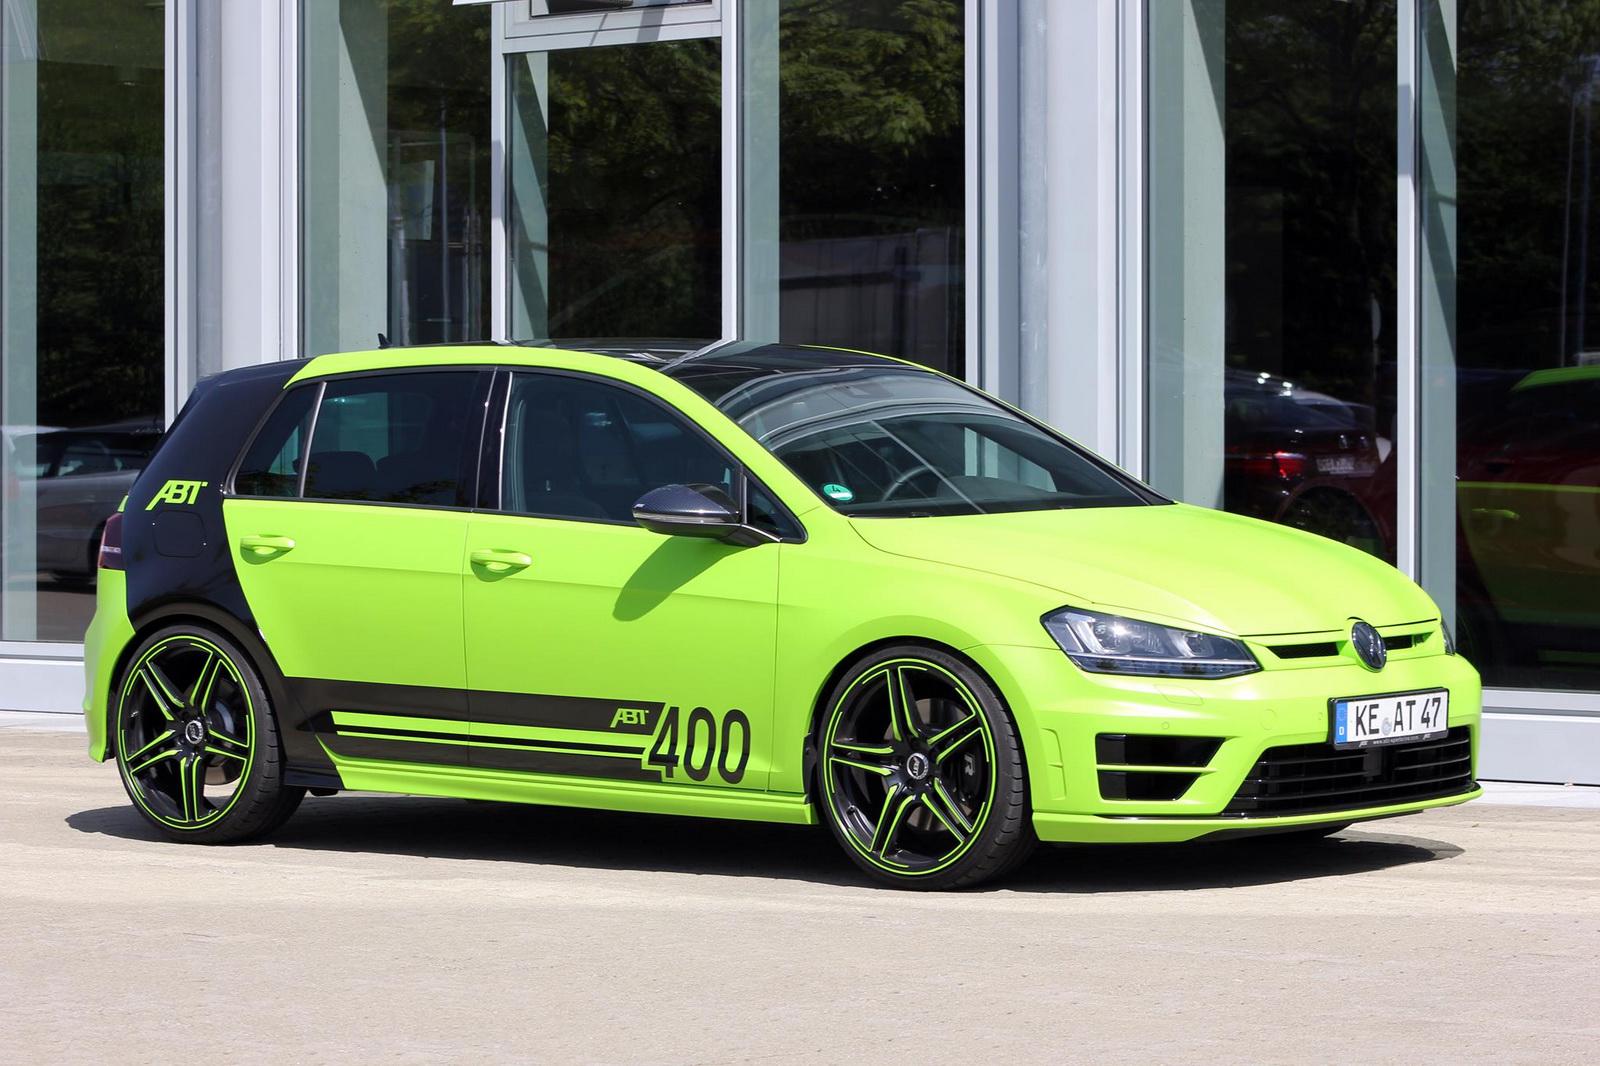 abt reveals lime green 400hp volkswagen golf r gtspirit. Black Bedroom Furniture Sets. Home Design Ideas